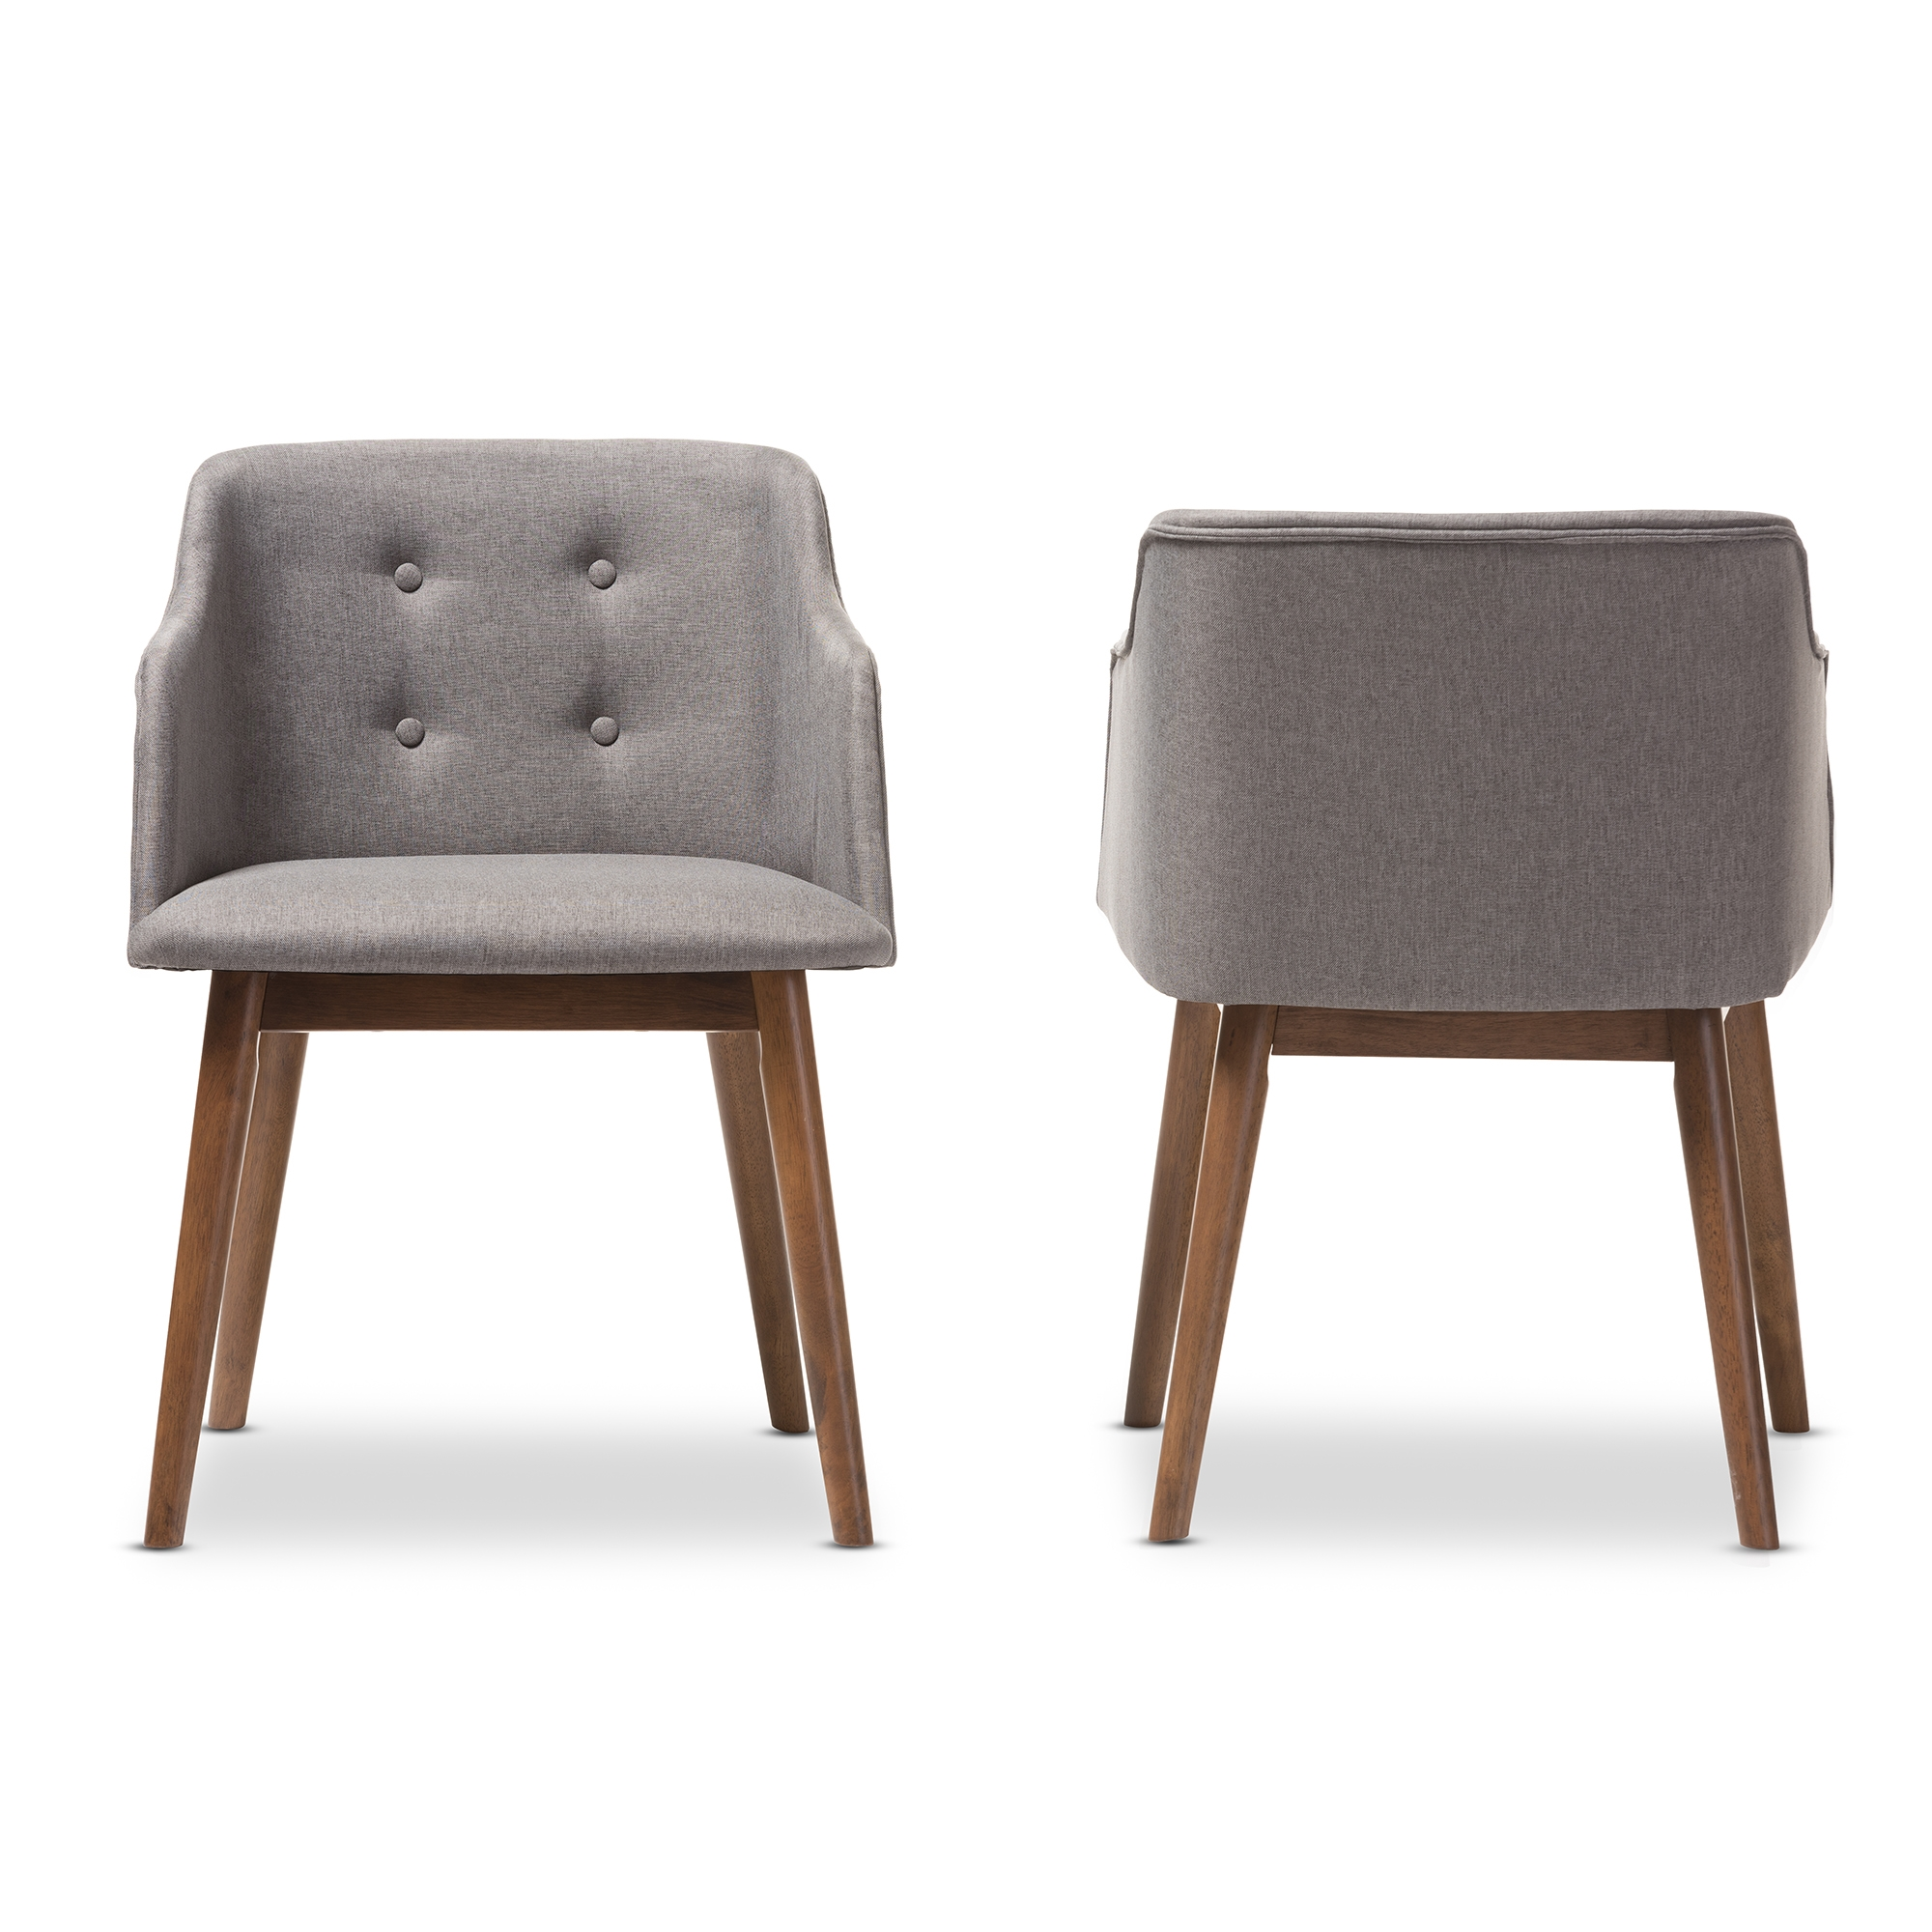 baxton studio harrison midcentury modern grey fabric and walnut brown wood accent chair